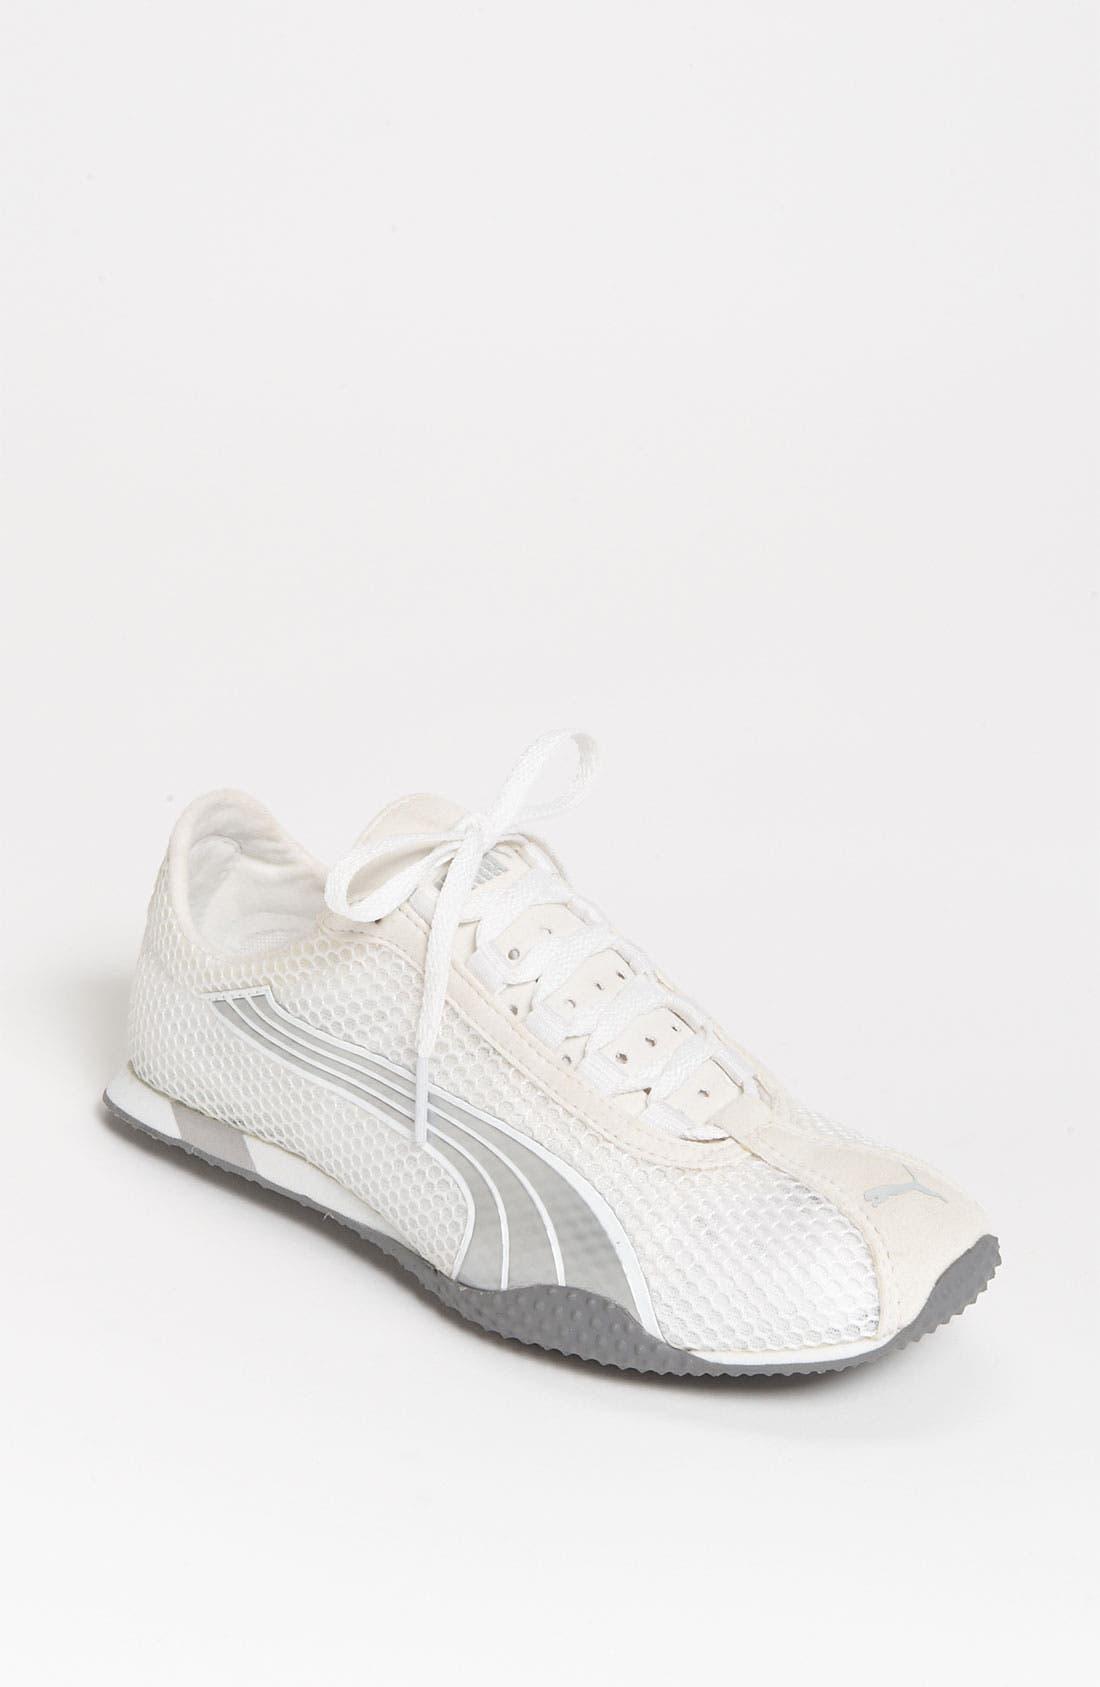 Main Image - PUMA 'H Street' Sneaker (Women)